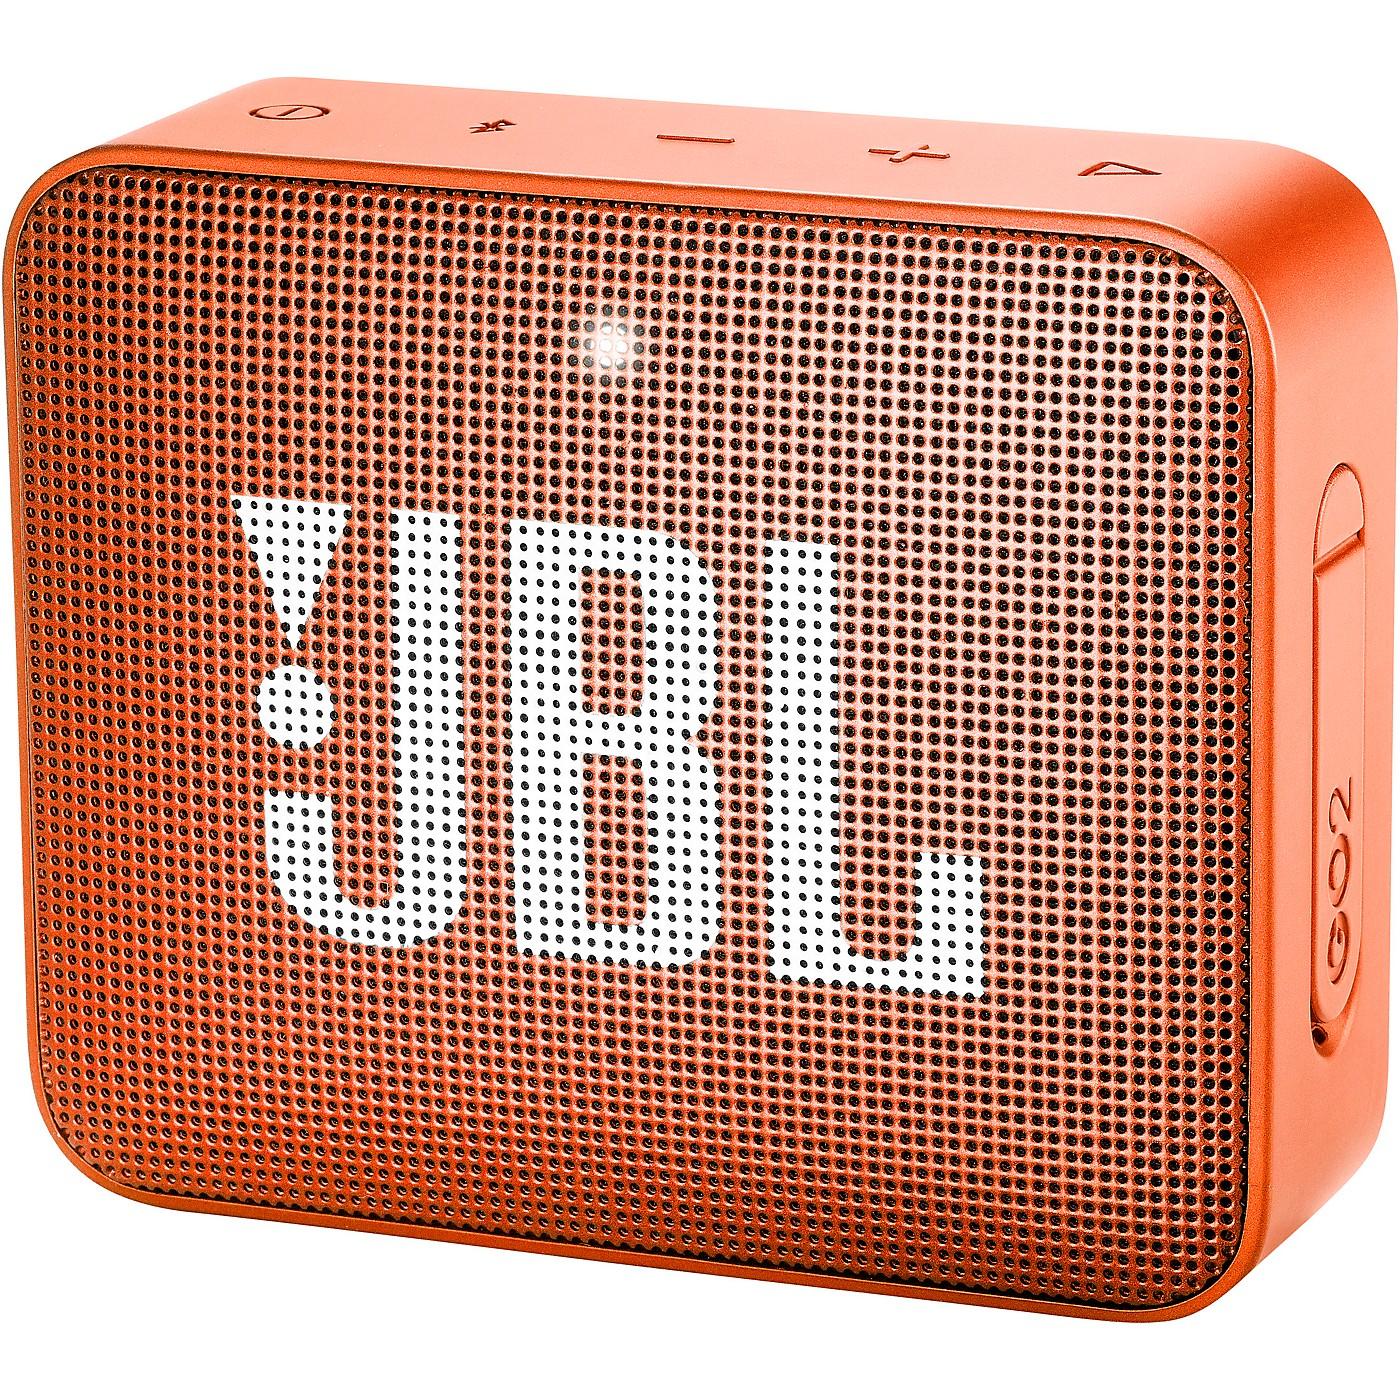 JBL Go 2 Portable Bluetooth Wireless Speaker thumbnail